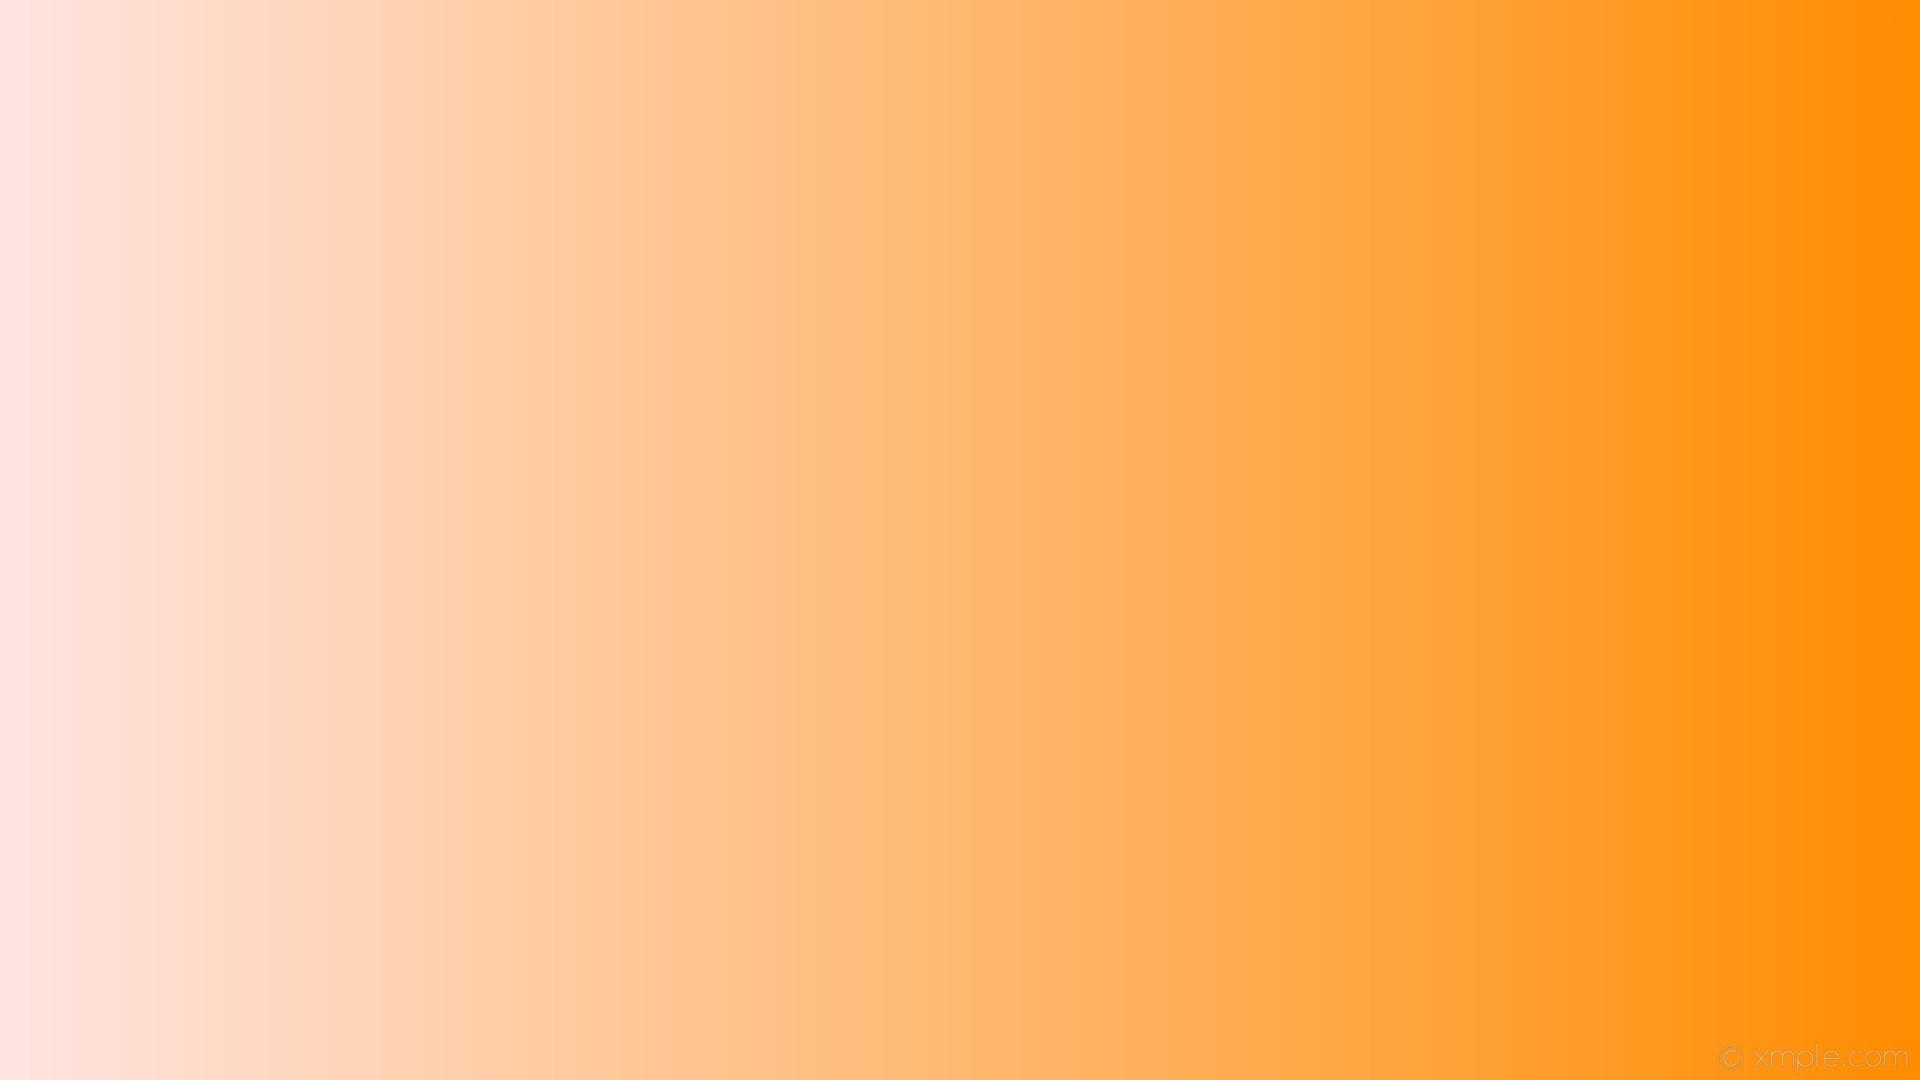 wallpaper gradient orange linear white misty rose dark orange #ffe4e1  #ff8c00 180°